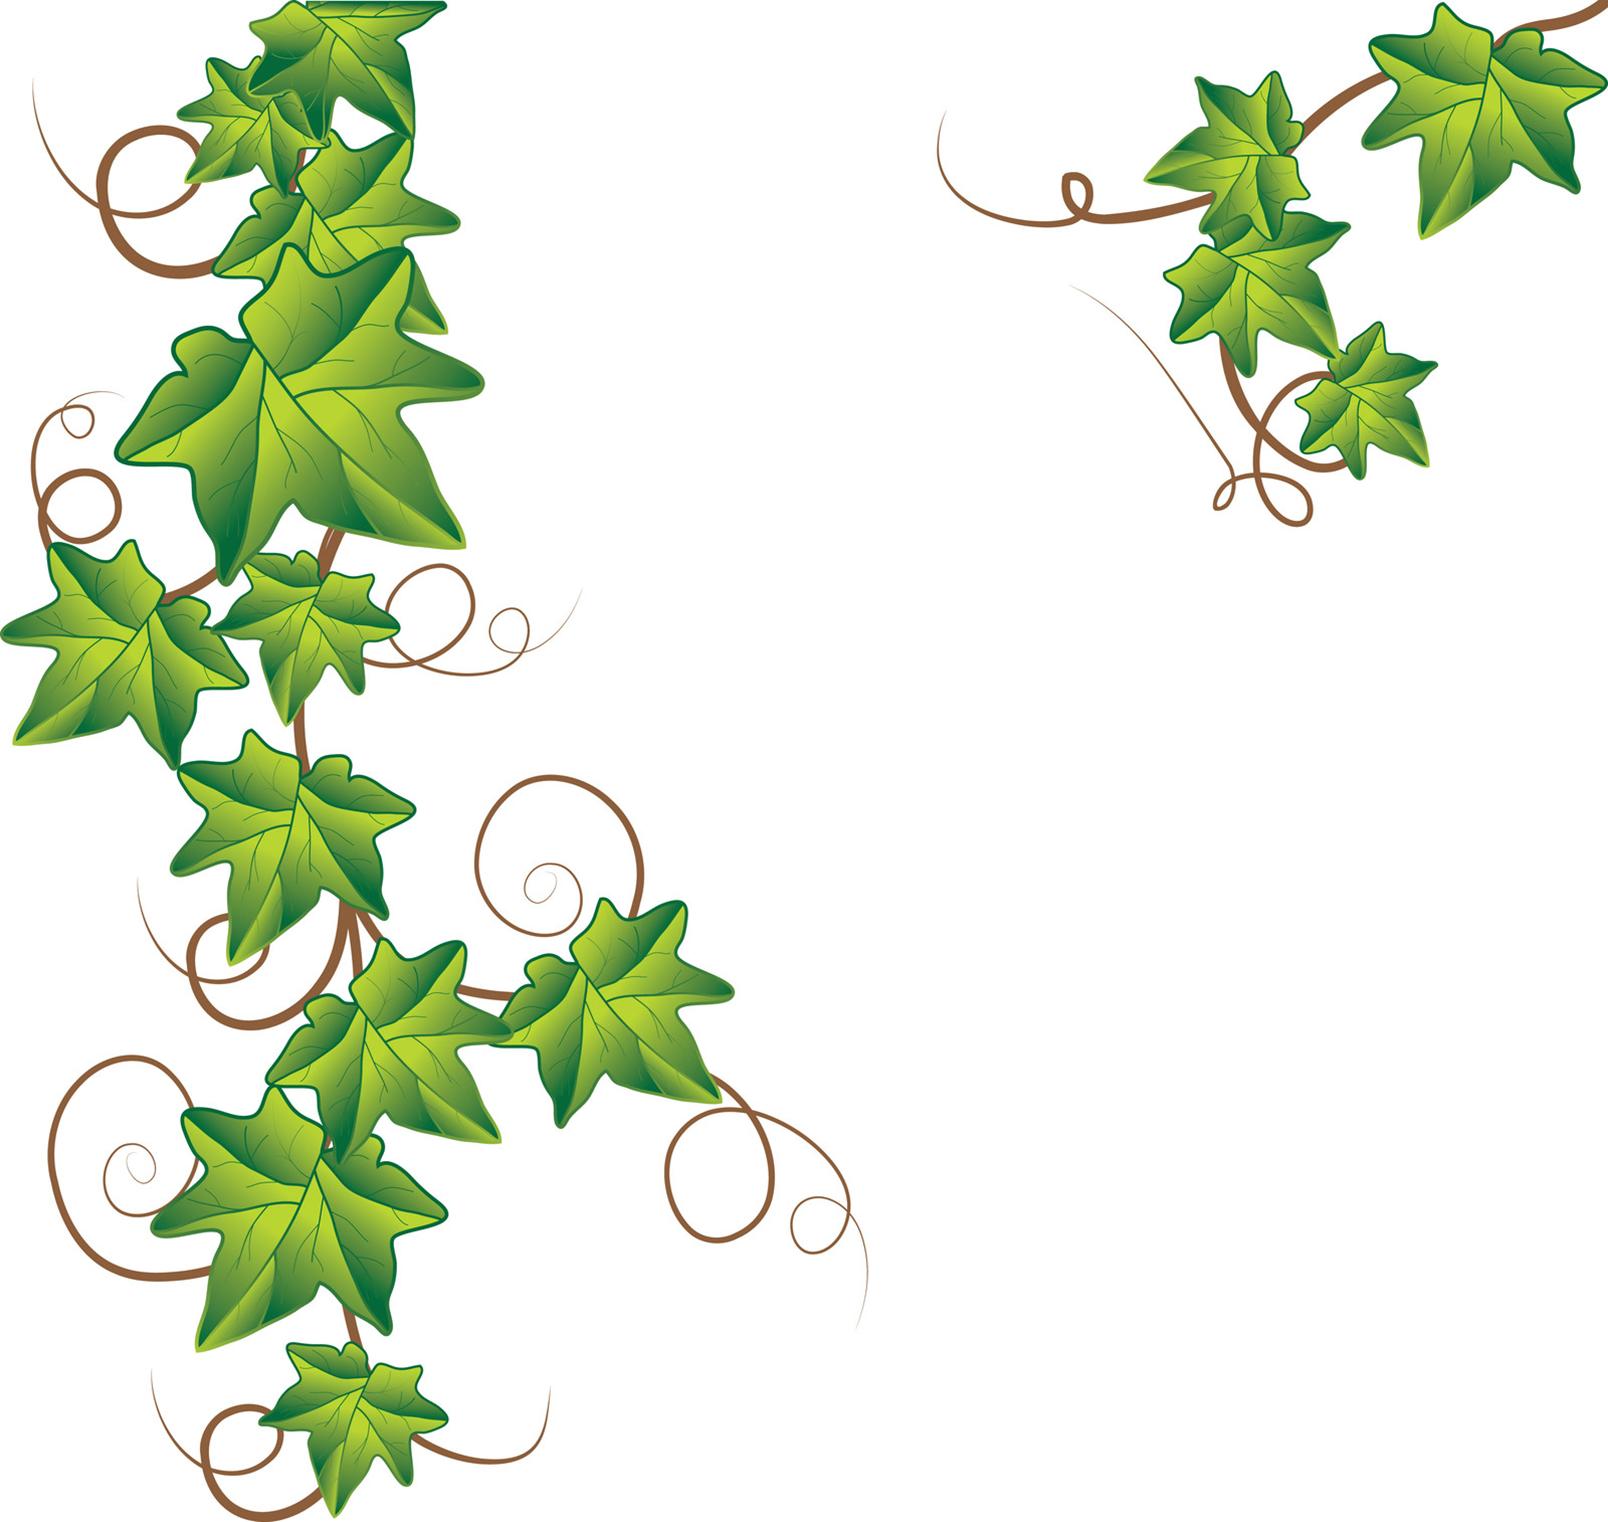 Drawn ivy branch Vector  vector royalty image